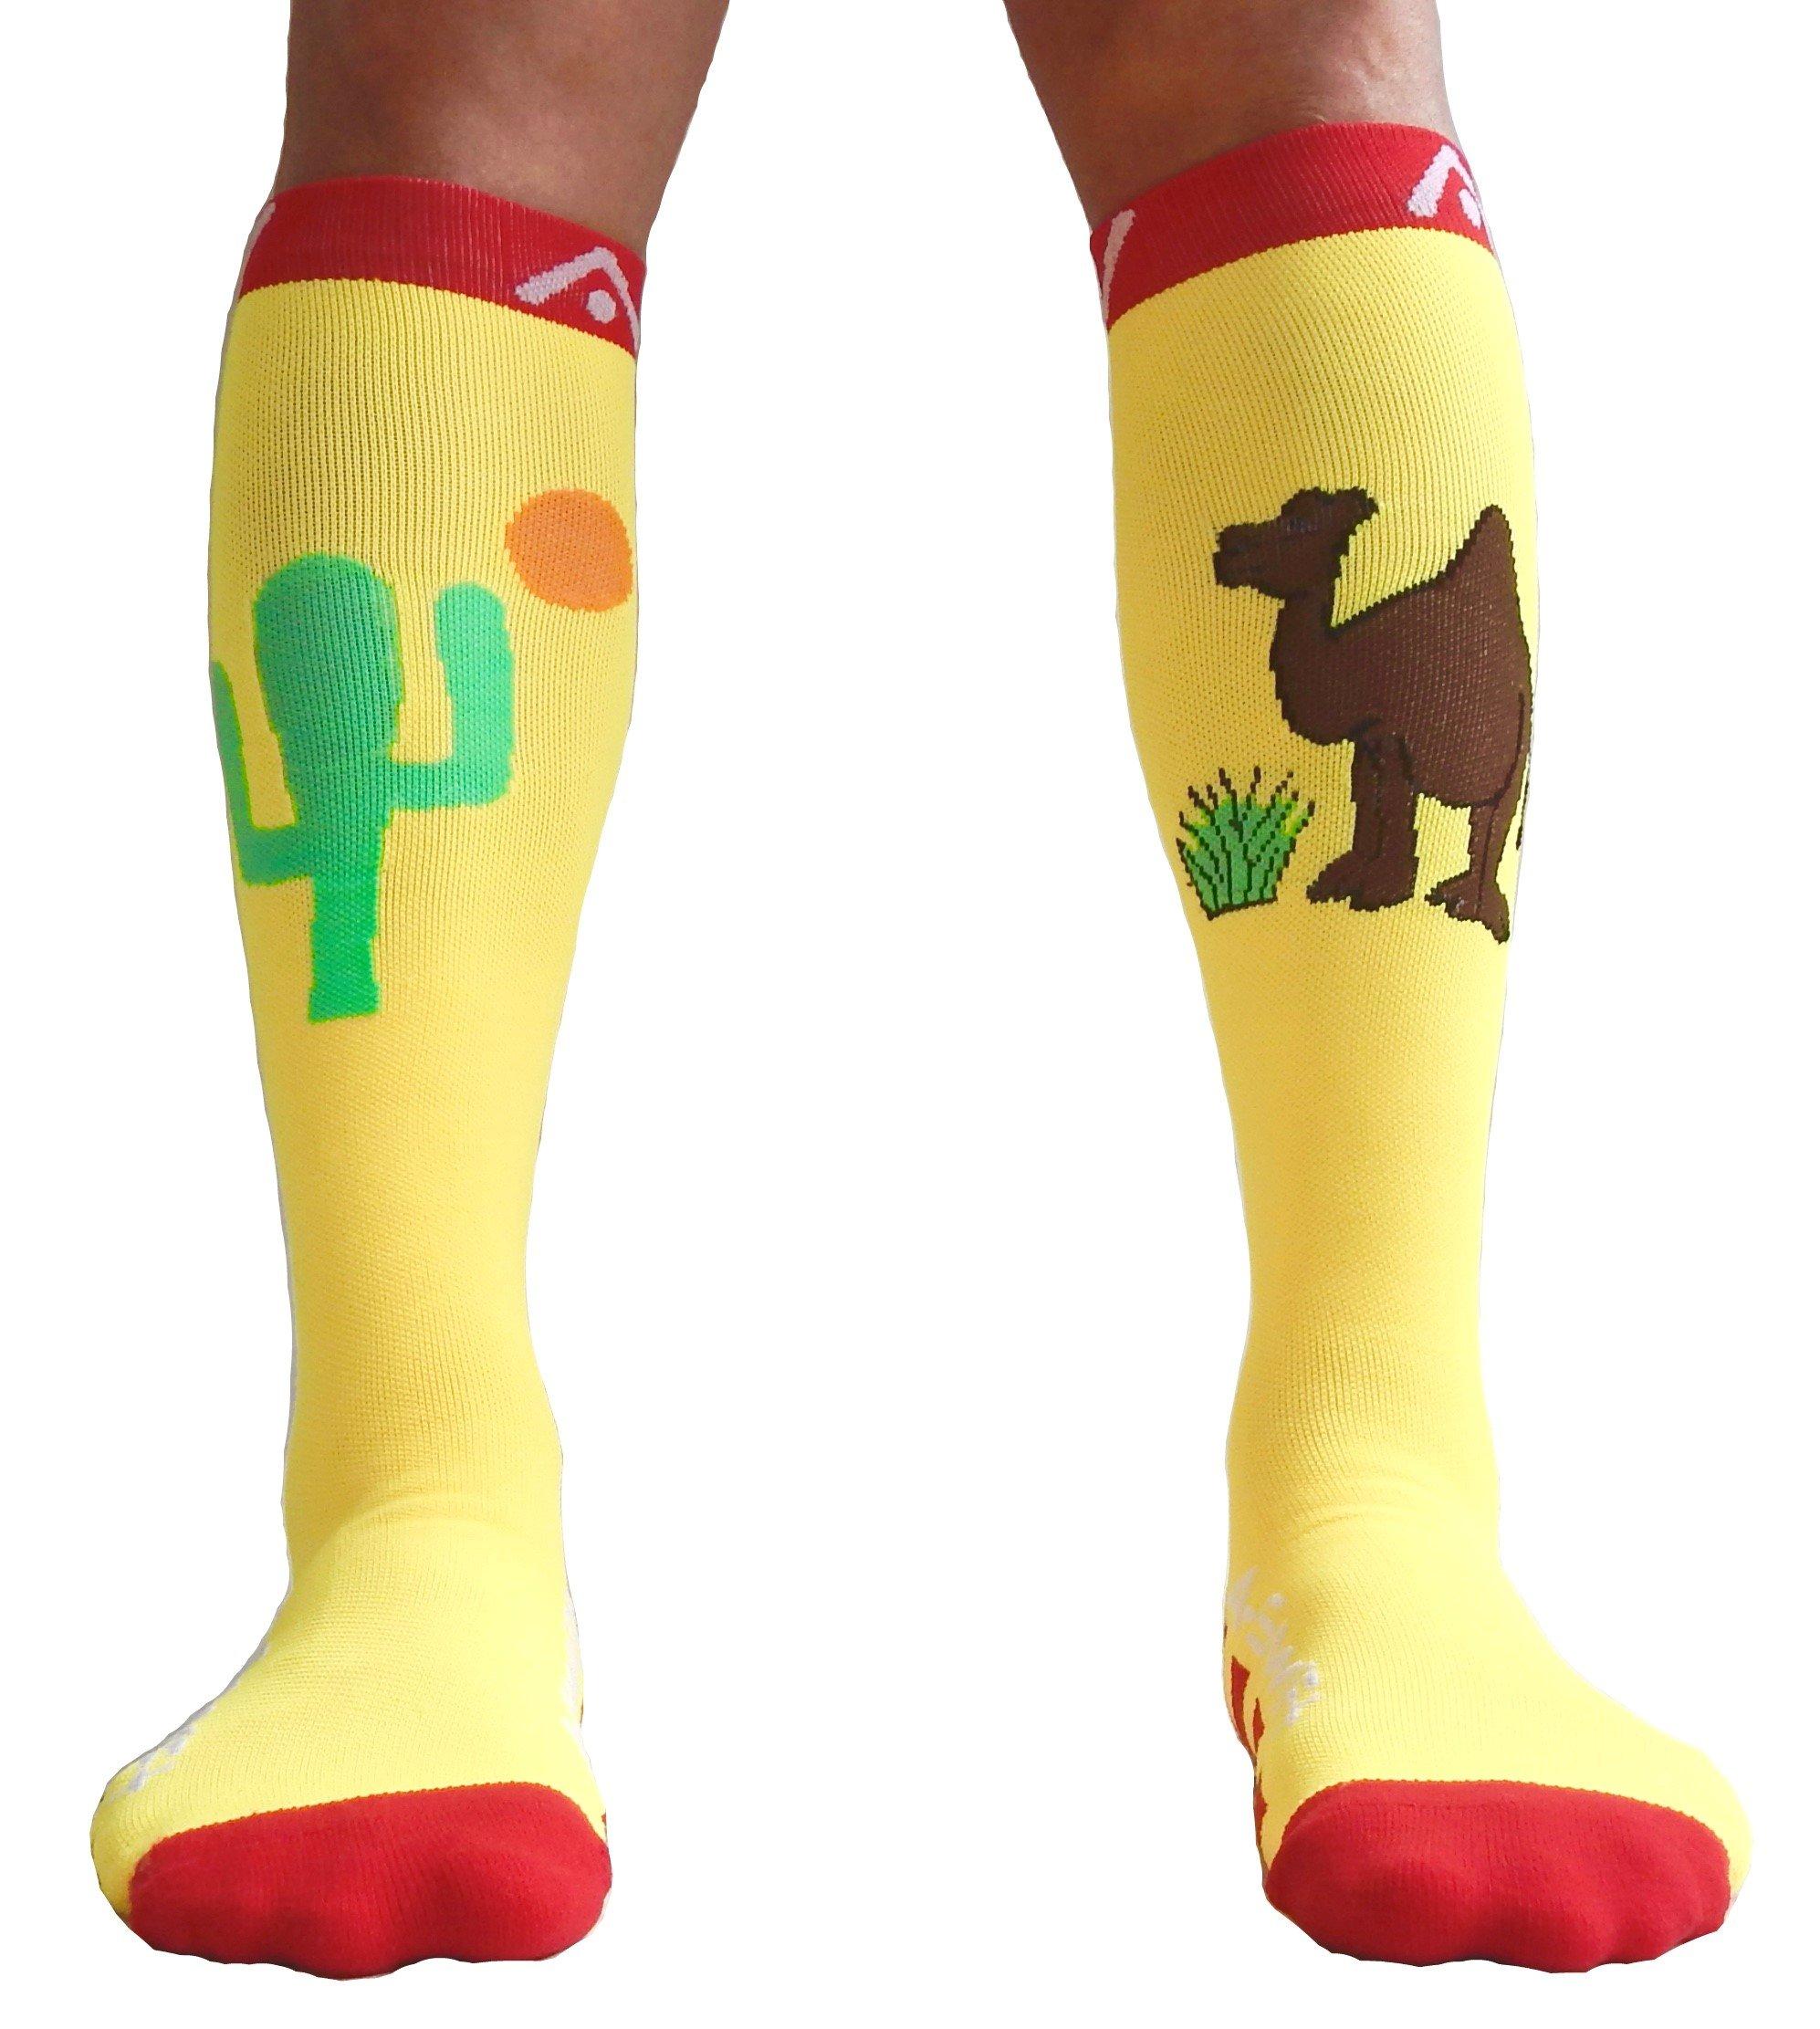 f6c5aa998 A-Swift Compression Socks for Women   Men - Desert Bliss